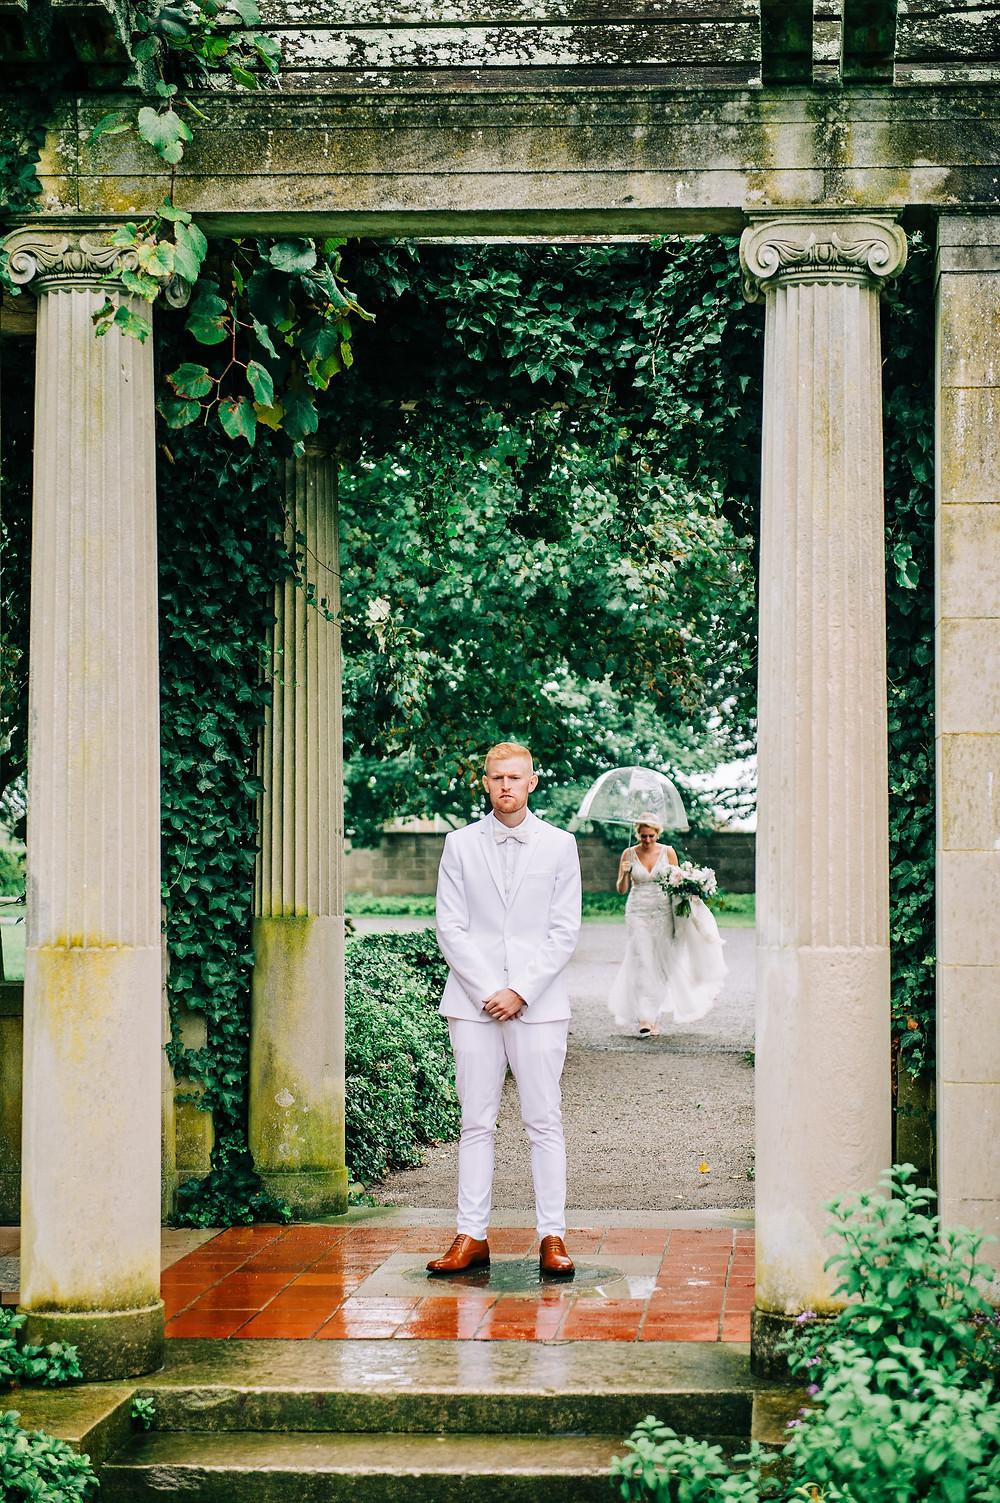 Pastel Summer Wedding Photoshoot at Eolia Mansion